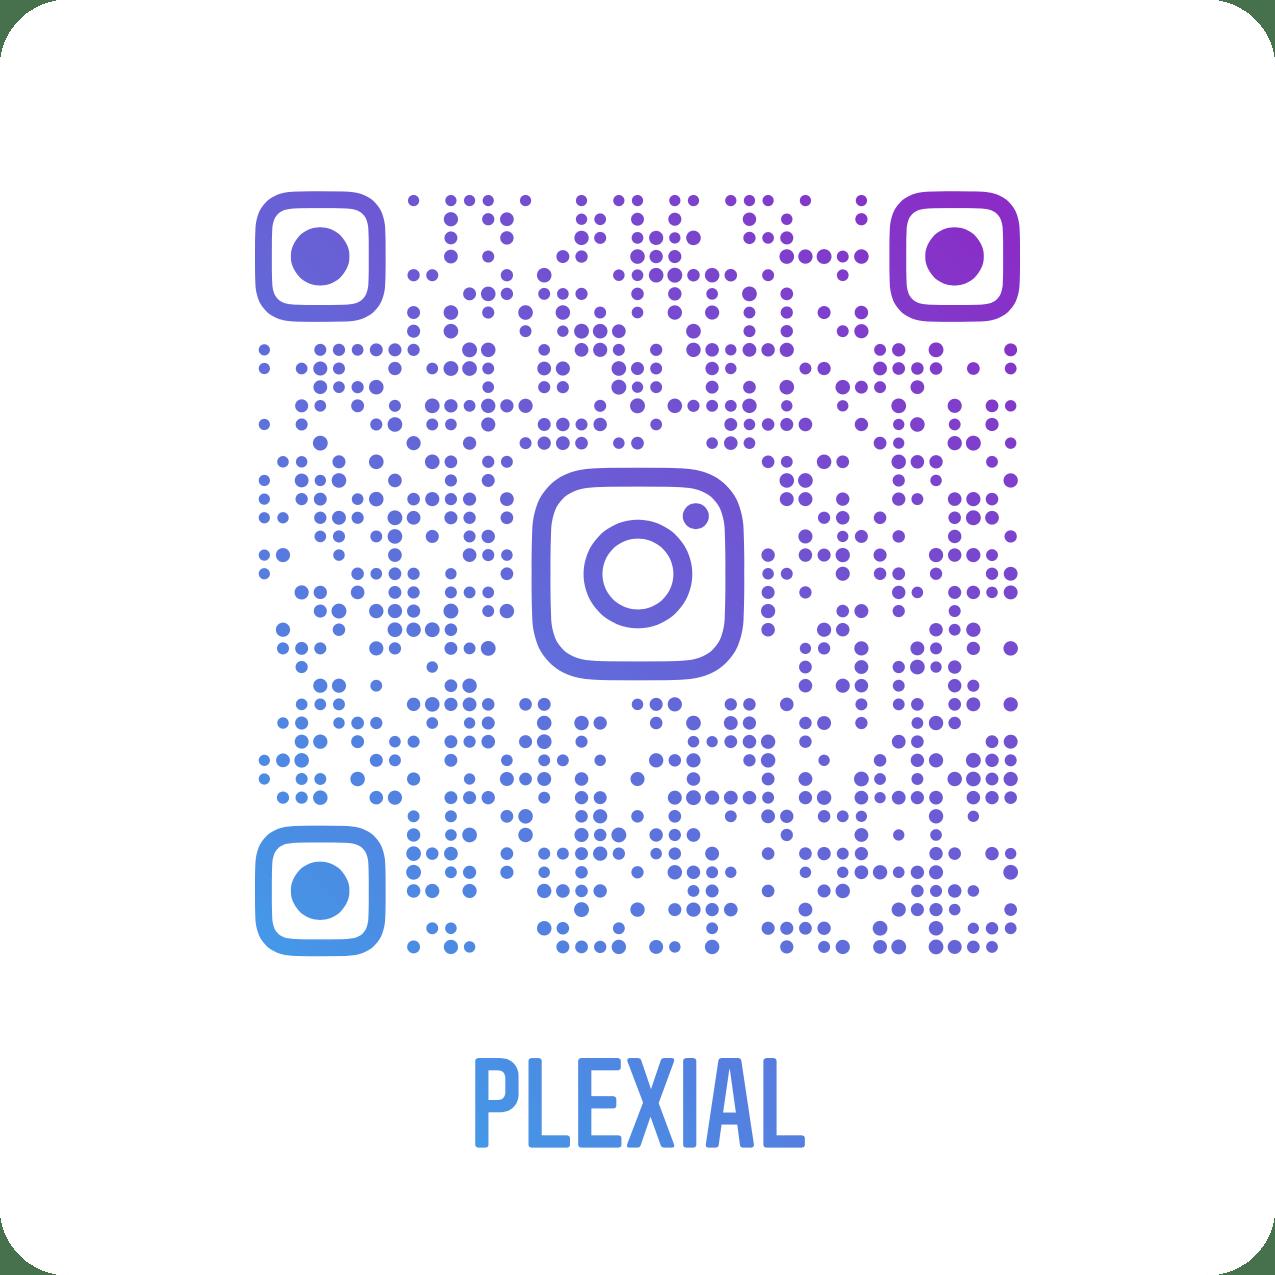 plexial_nametag